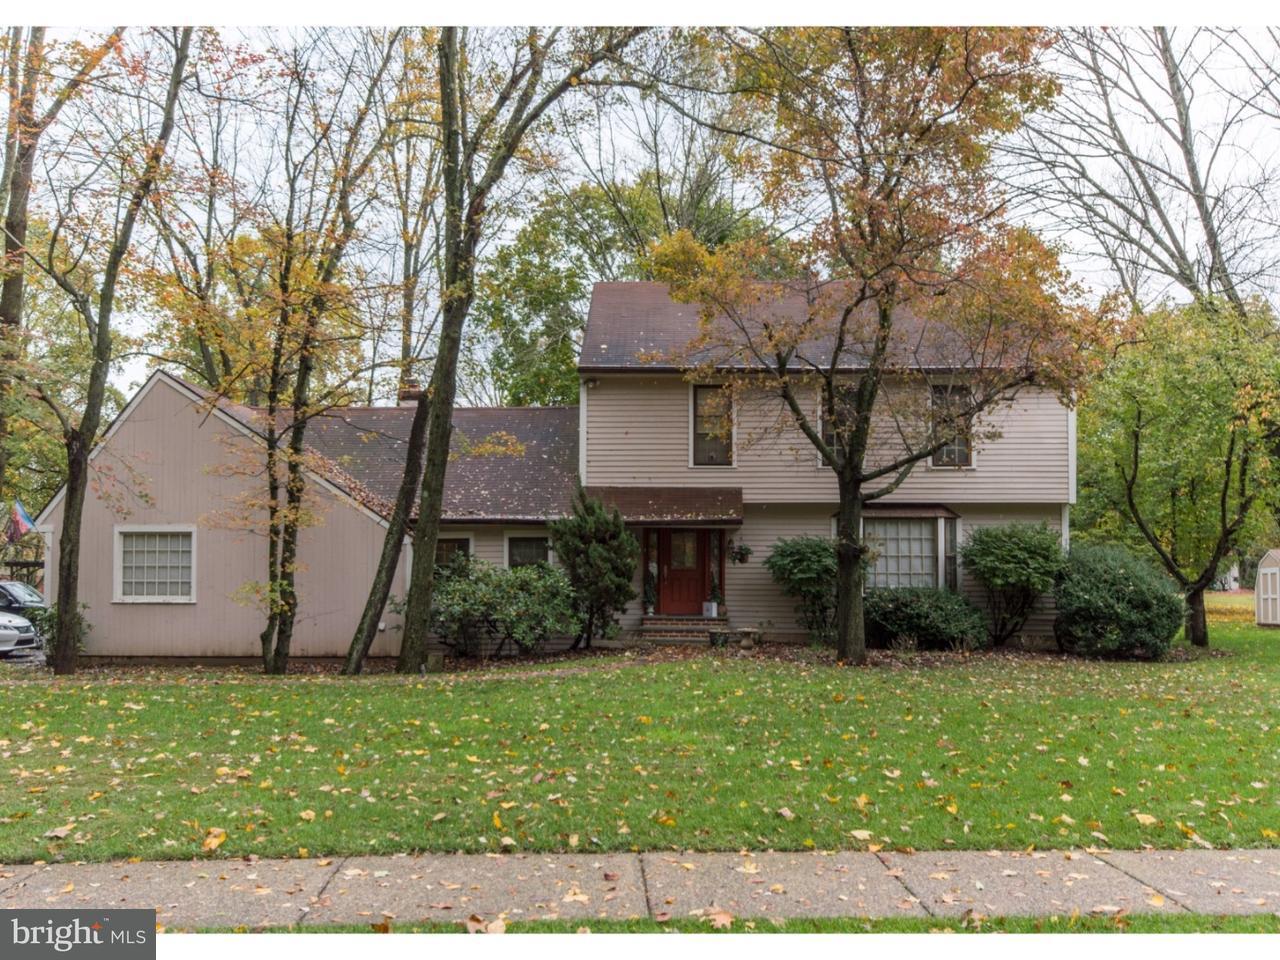 Single Family Home for Sale at 27 MOHAWK Avenue New Britain, Pennsylvania 18901 United States